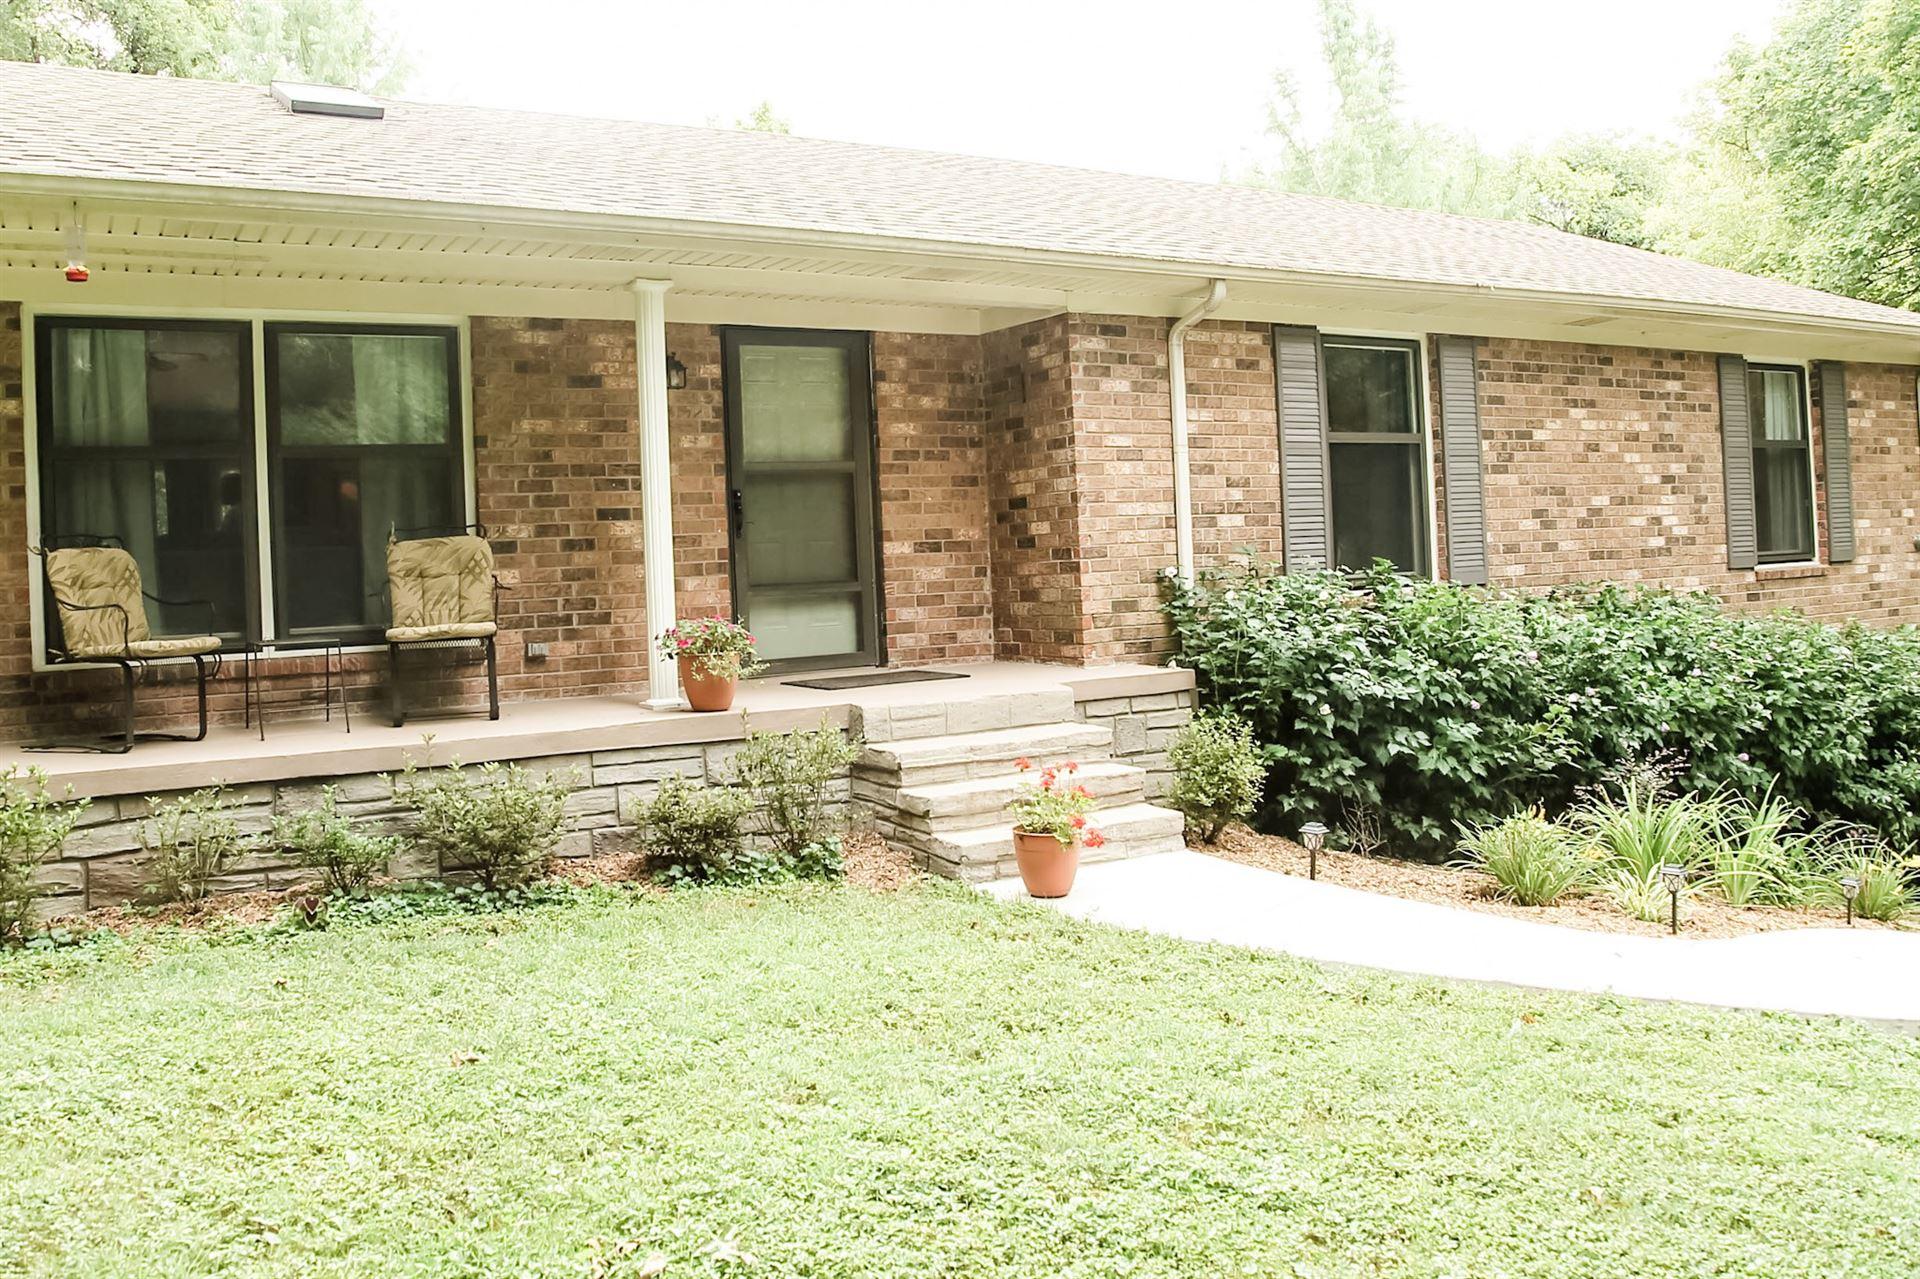 706 McCrory Creek Rd, Nashville, TN 37214 - MLS#: 2221941